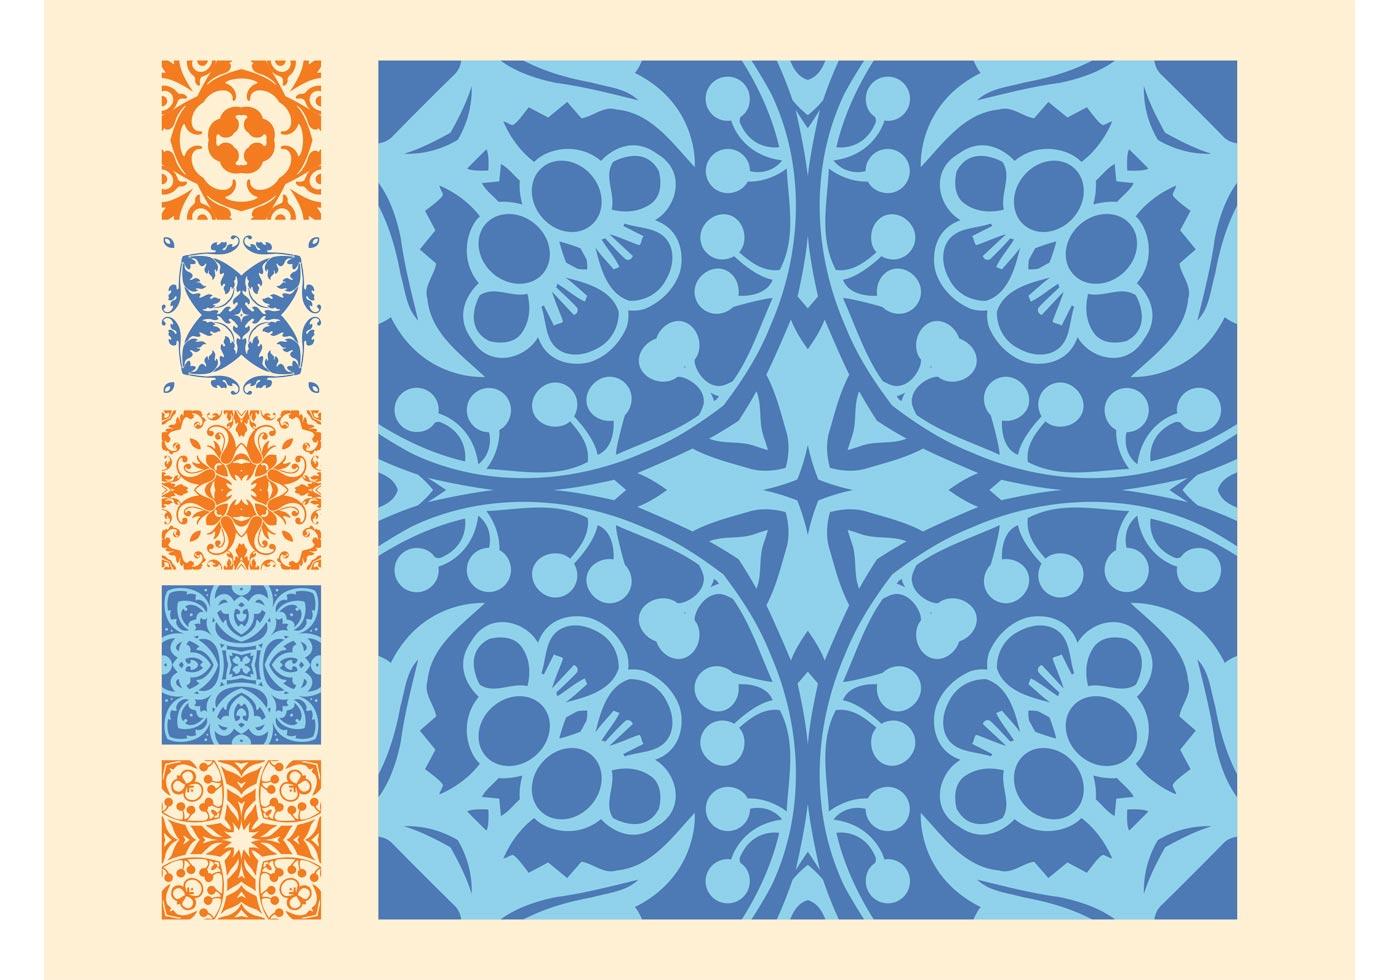 Vintage Tiles Free Vector Art 11653 Free Downloads